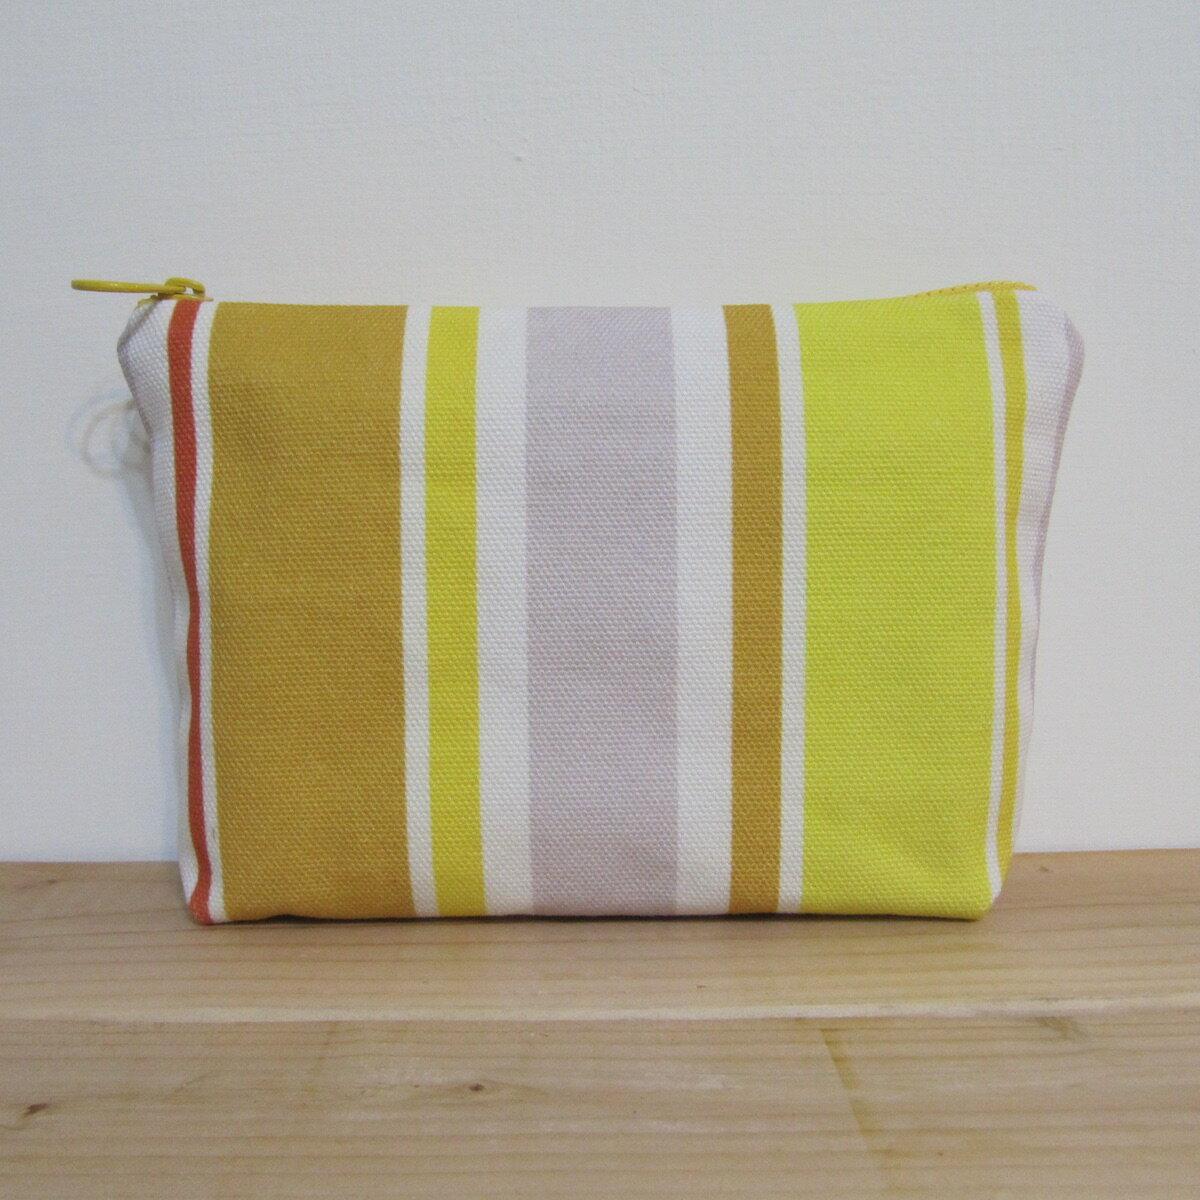 ~Lilytata 黃色 溫馨接送 收納包 20x15x4cm~印花 收納包 化妝包